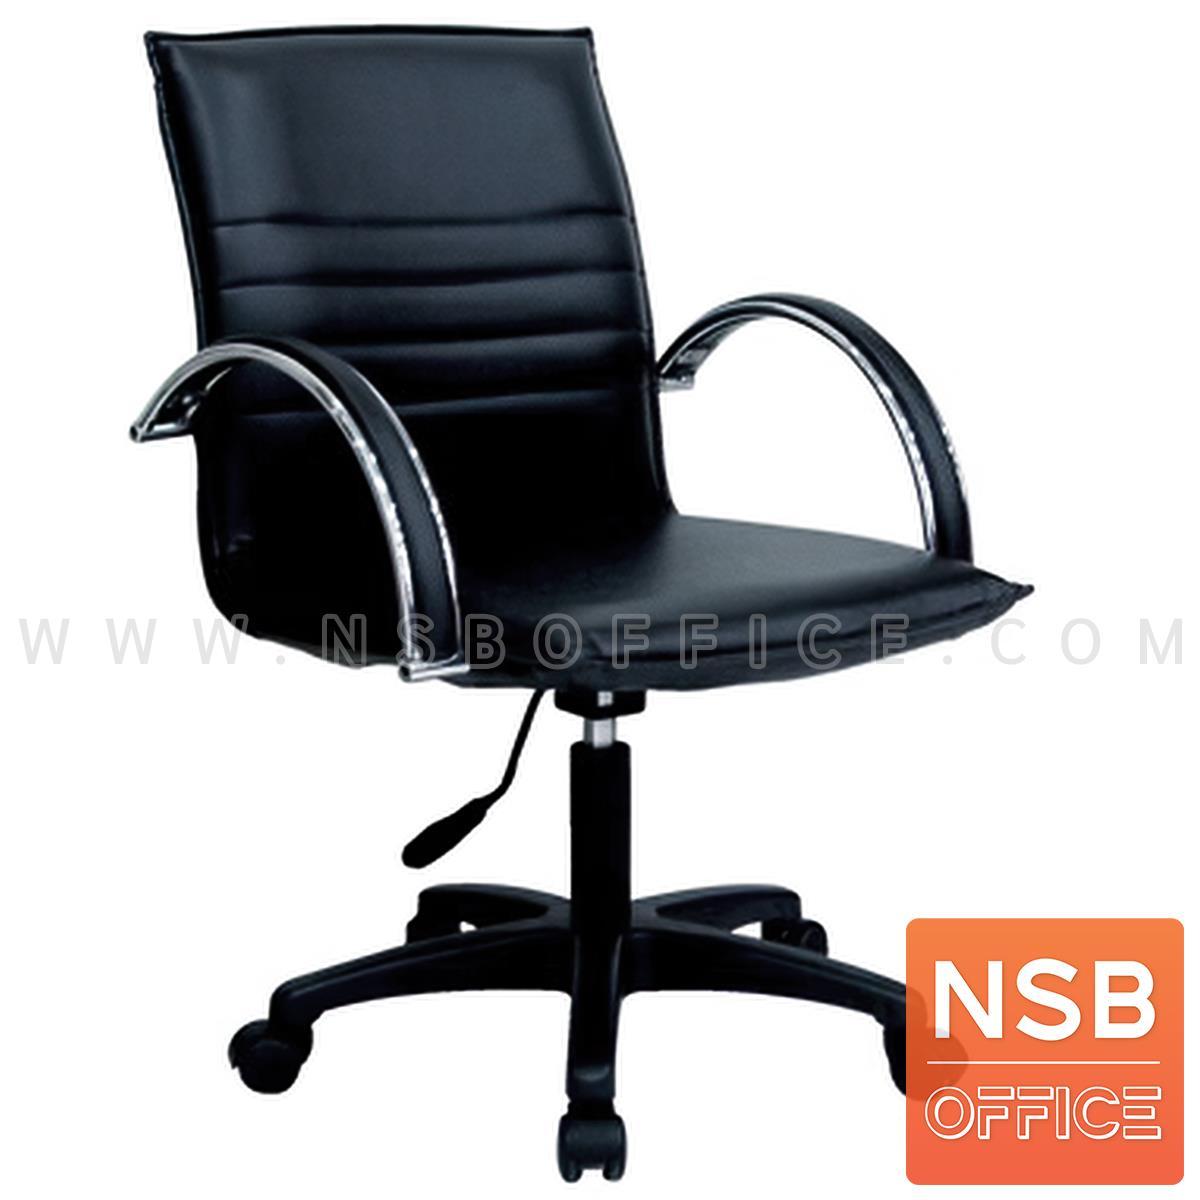 B03A512:เก้าอี้สำนักงาน รุ่น Hooch (ฮูช)  โช๊คแก๊ส มีก้อนโยก ขาพลาสติก